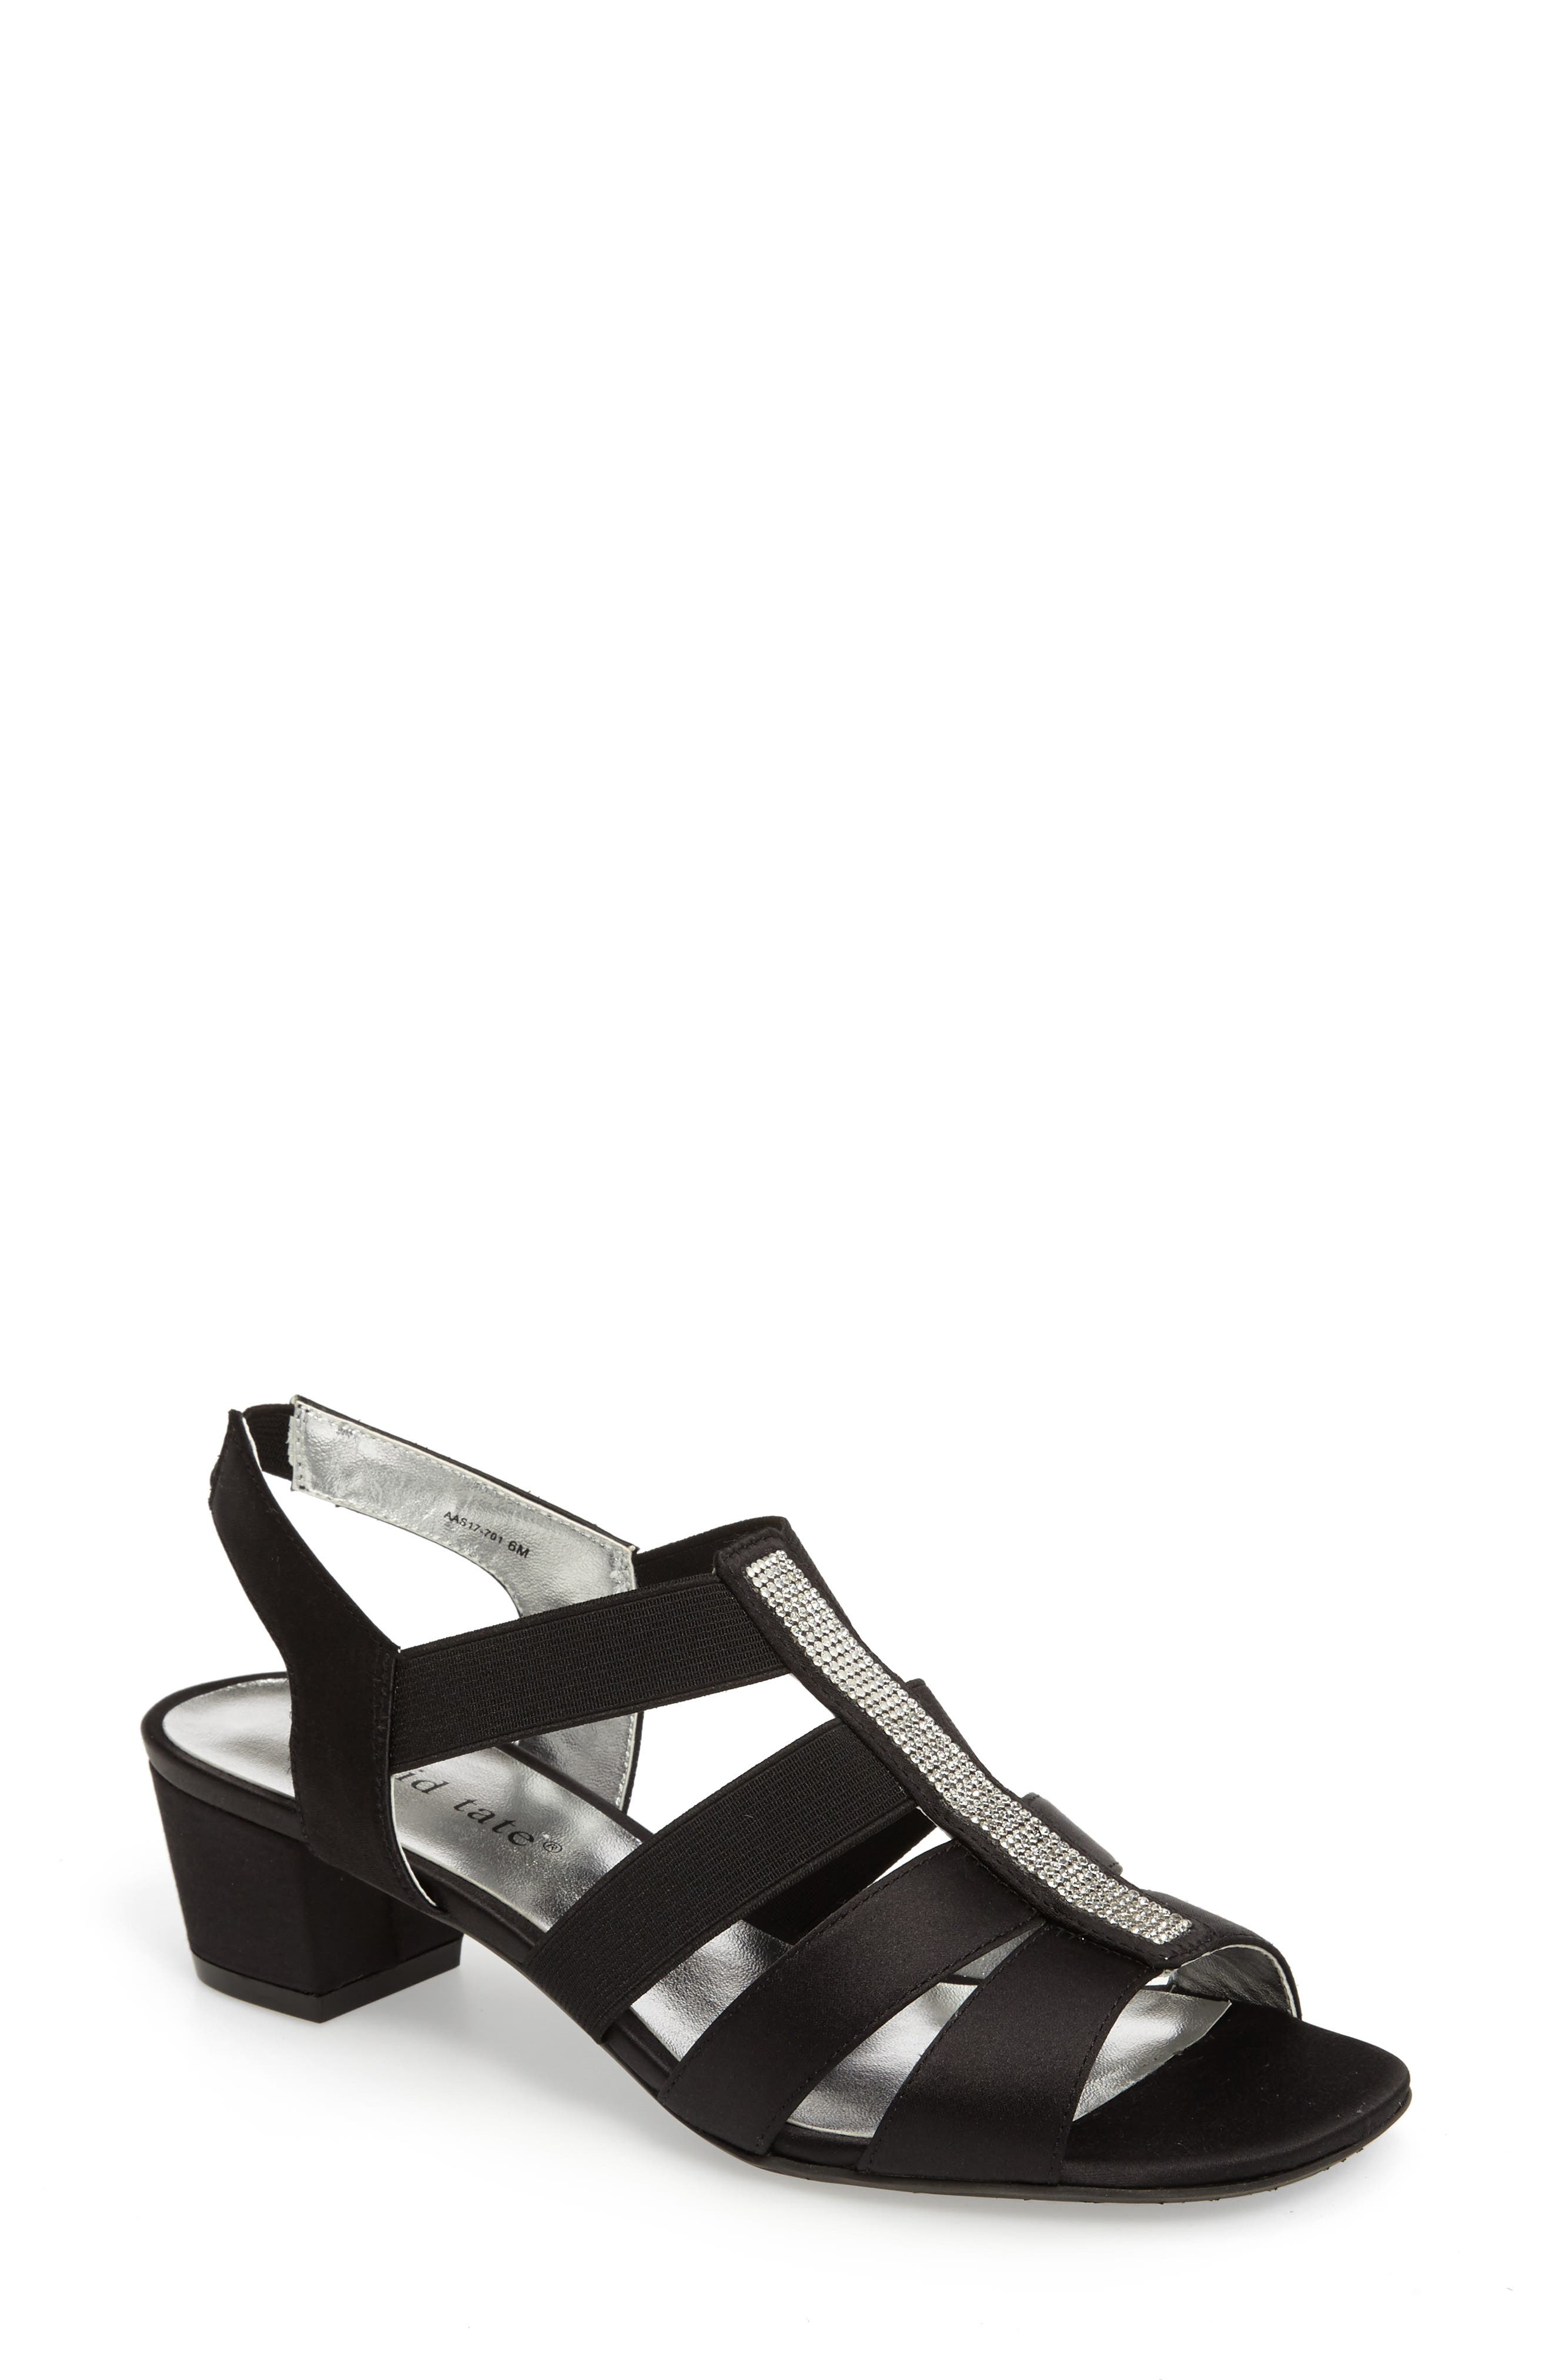 DAVID TATE Eve Embellished Sandal, Main, color, BLACK FABRIC